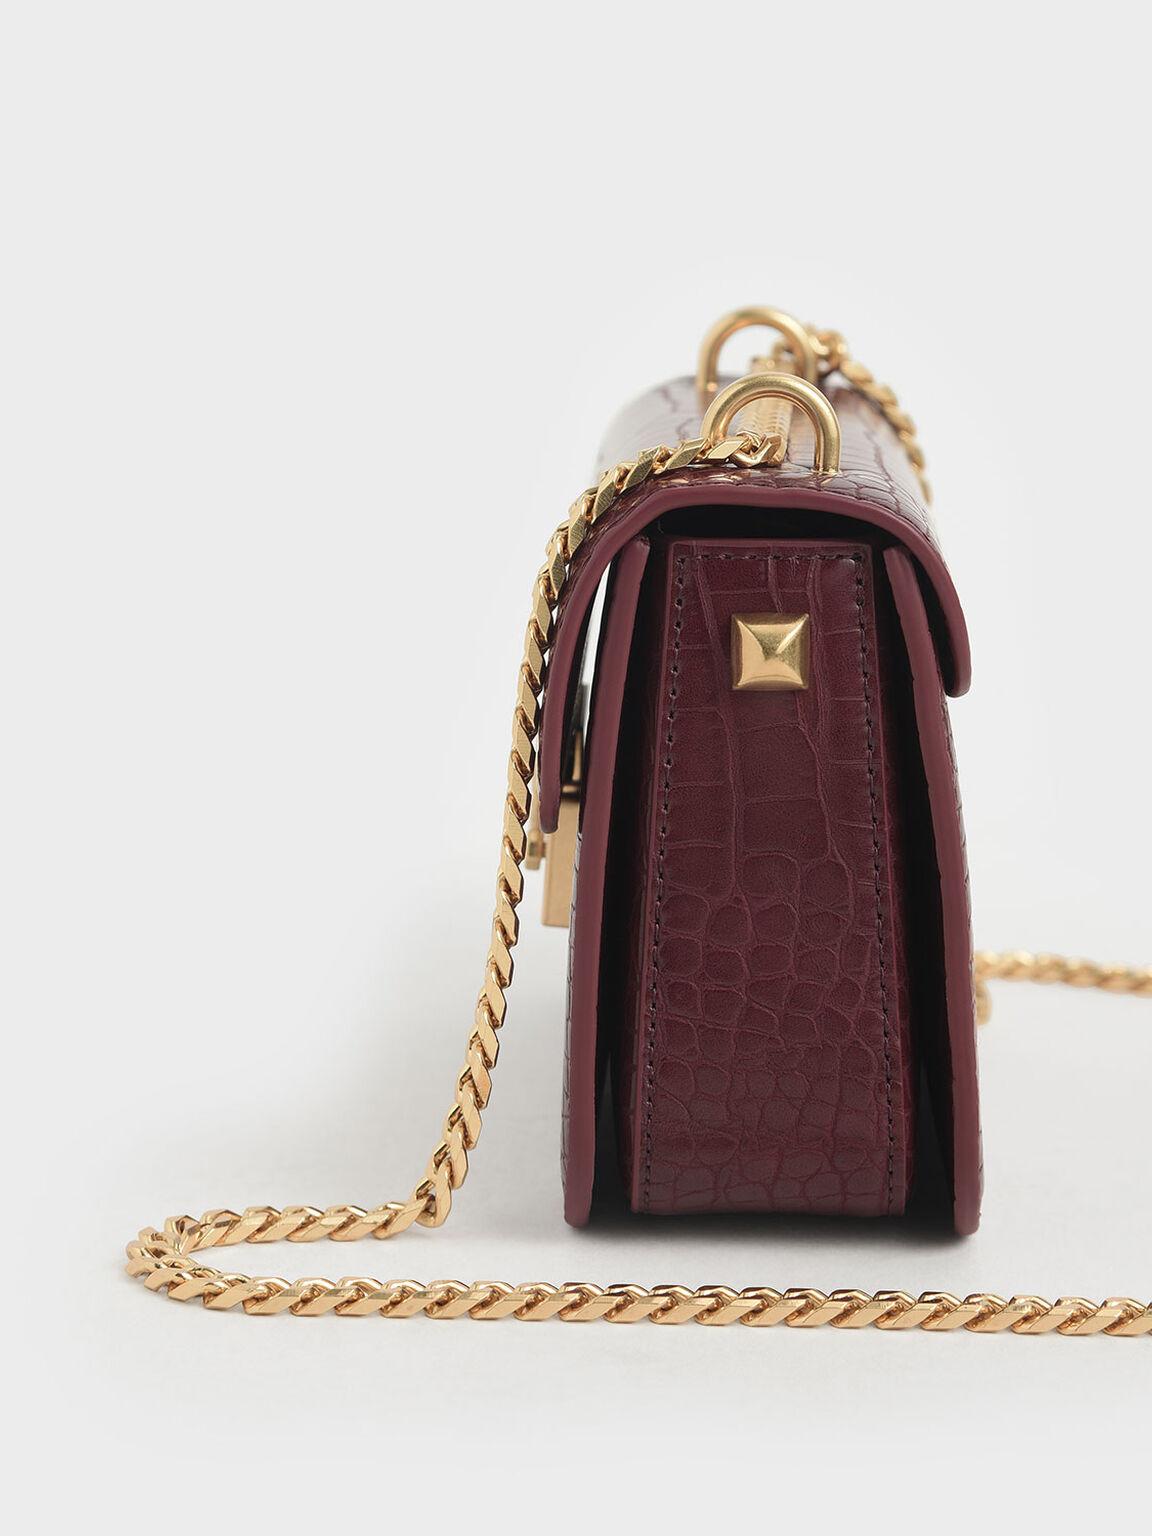 鱷魚紋鍊條包, 酒紅色, hi-res